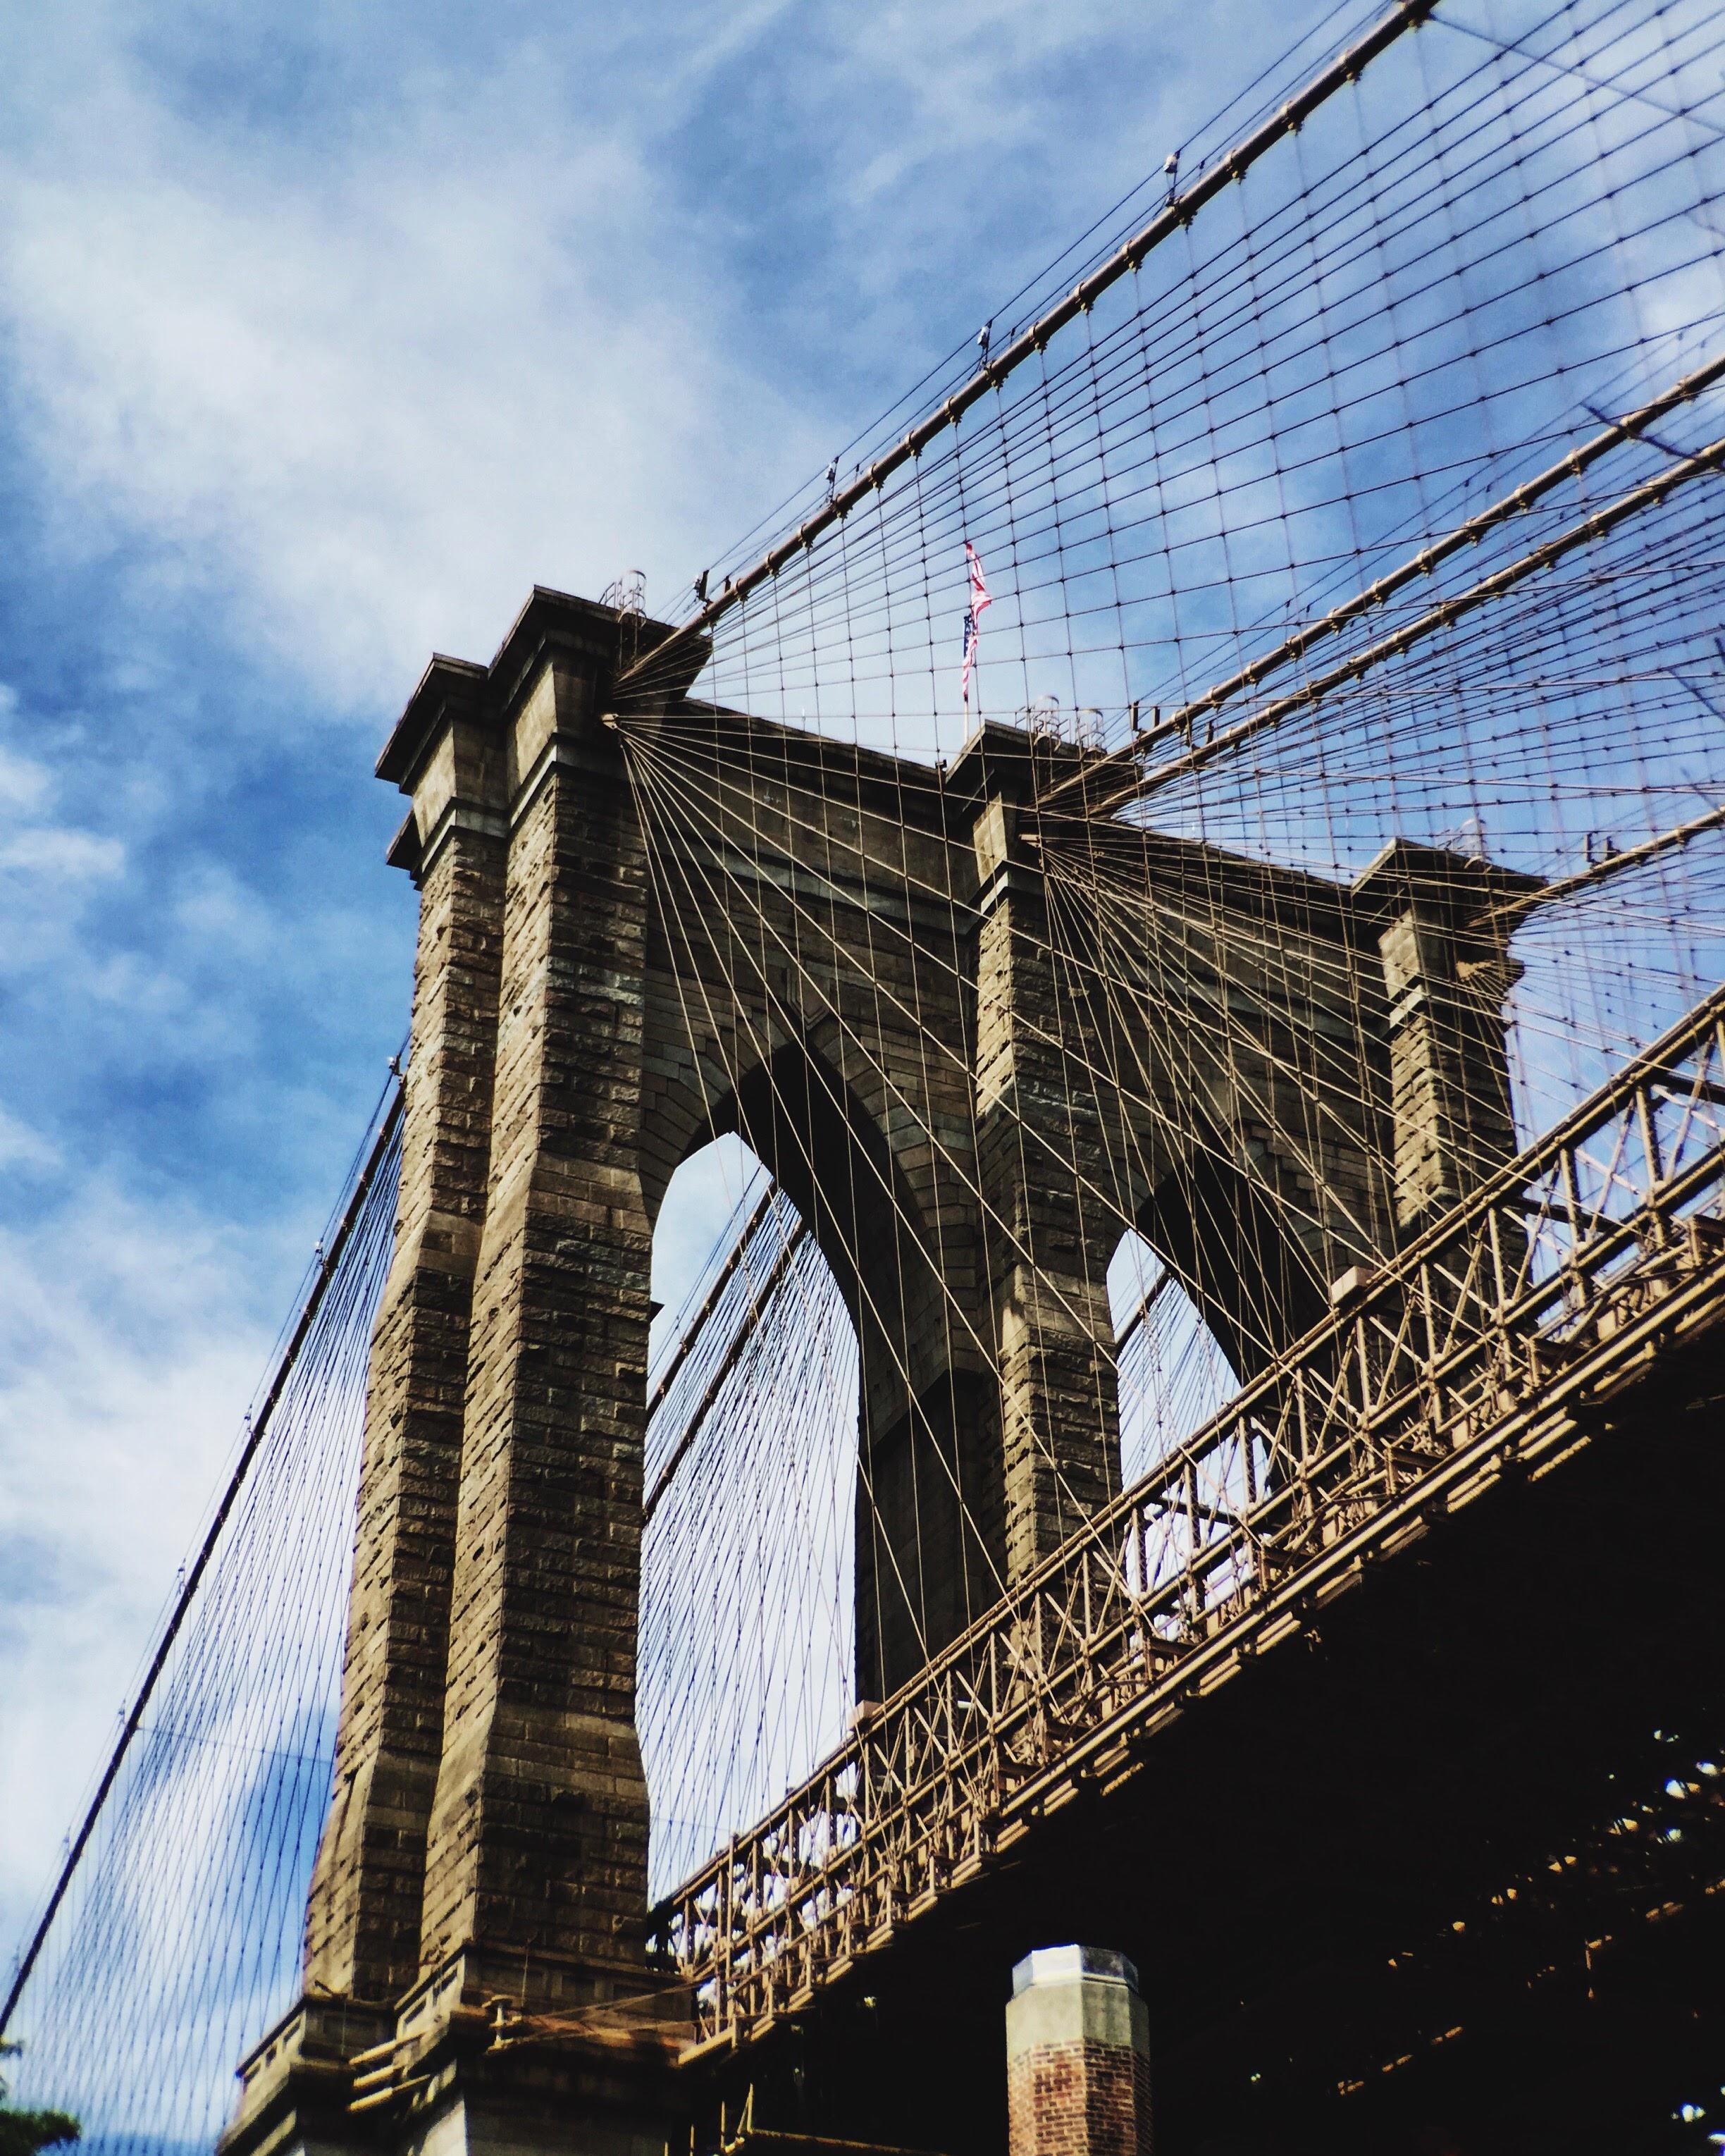 The McHowe World Tour - Brooklyn, New York, USA